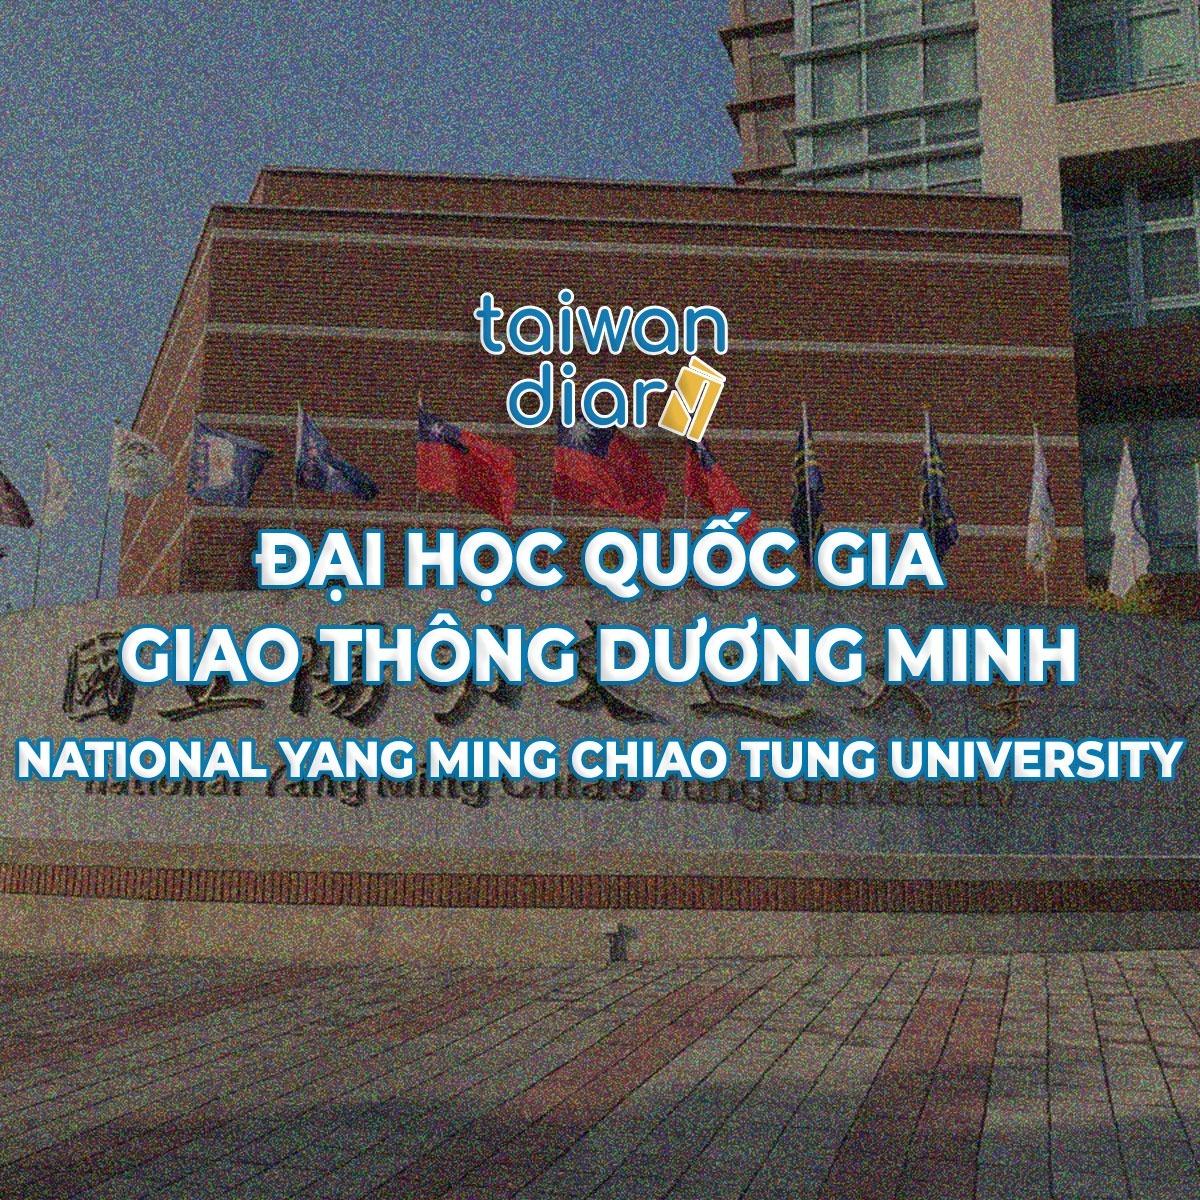 National-Yang-Ming-Chiao-Tung-University